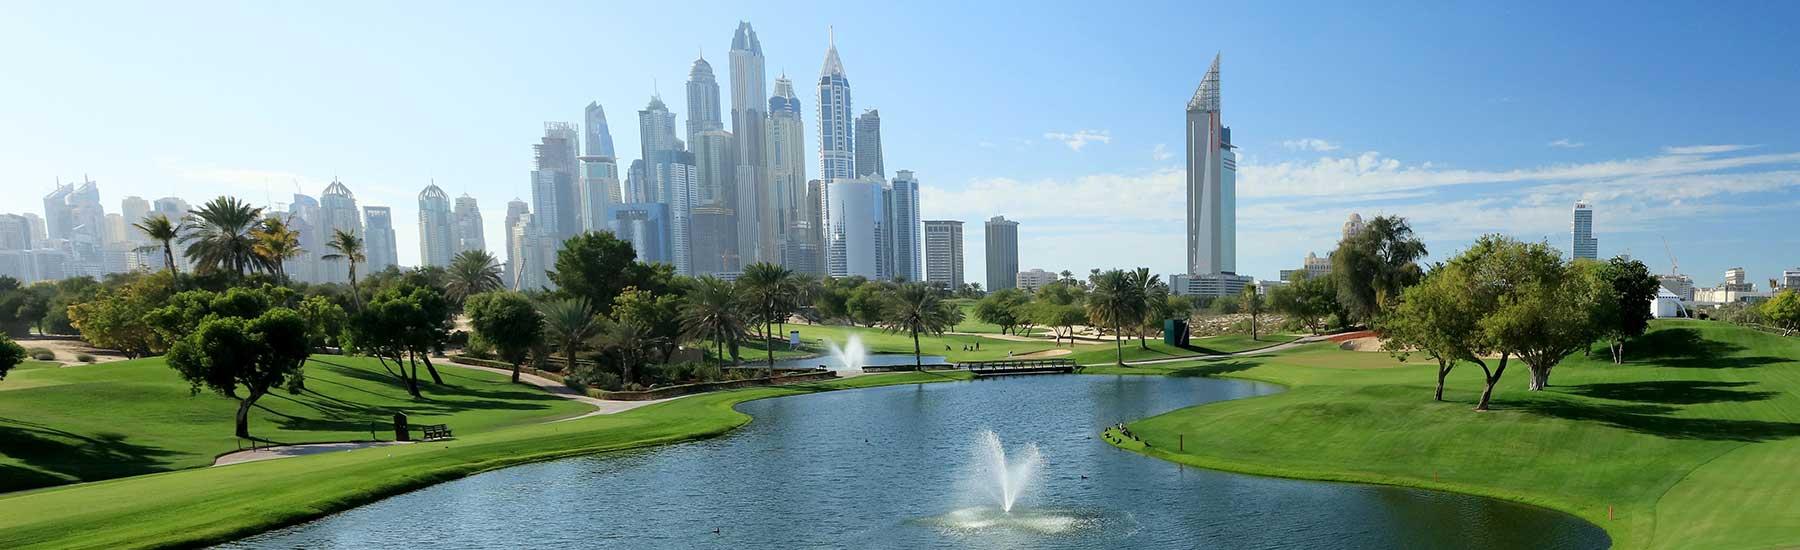 Dubai Golf: Tournaments, Championship Courses & More